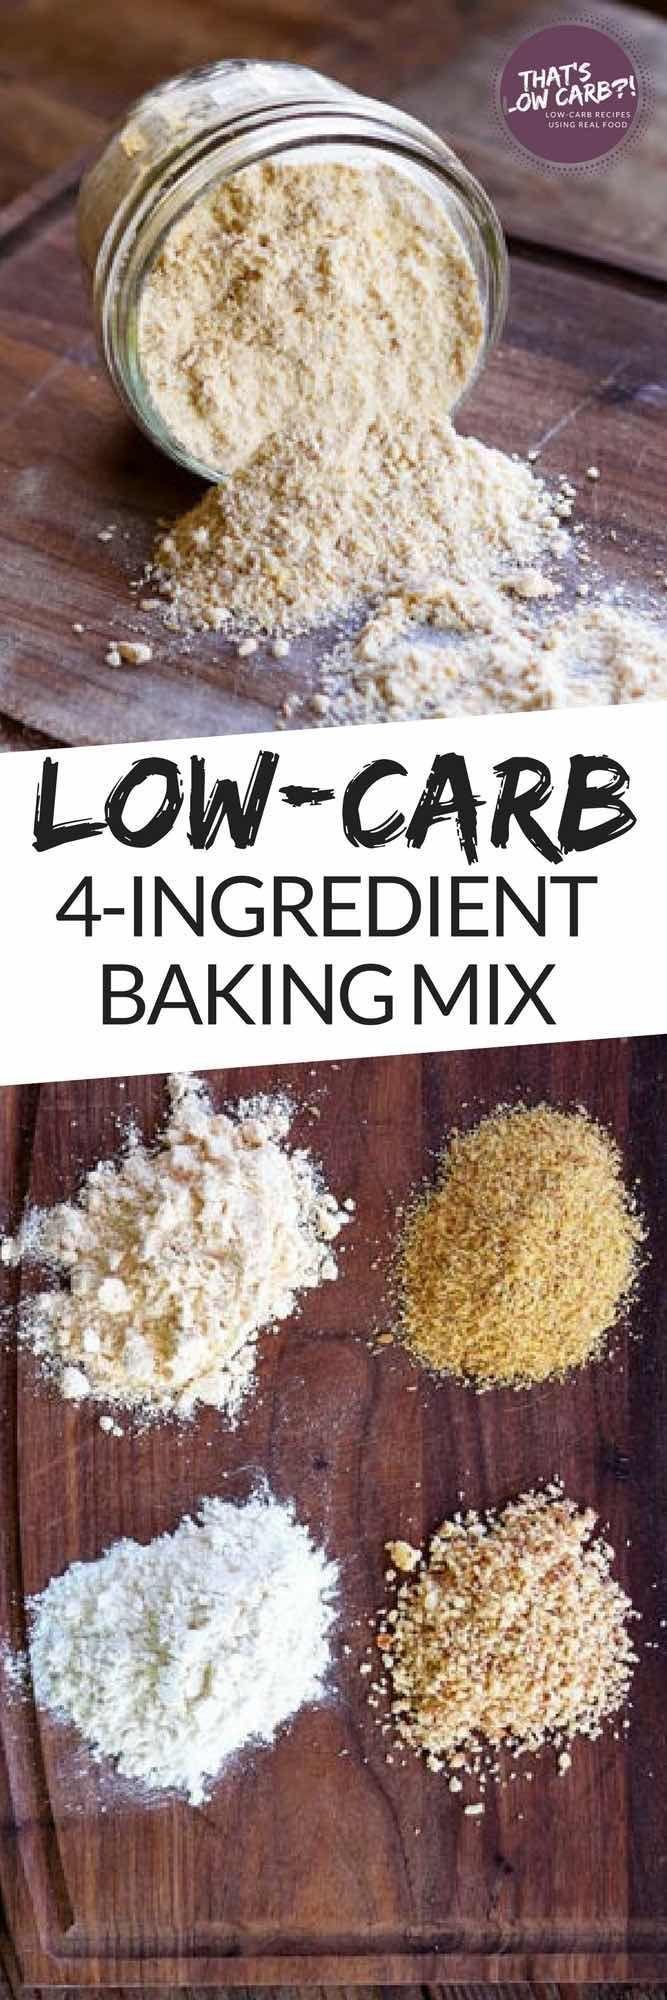 Low Carb Baking Flour Mix using just 4-Ingredients to